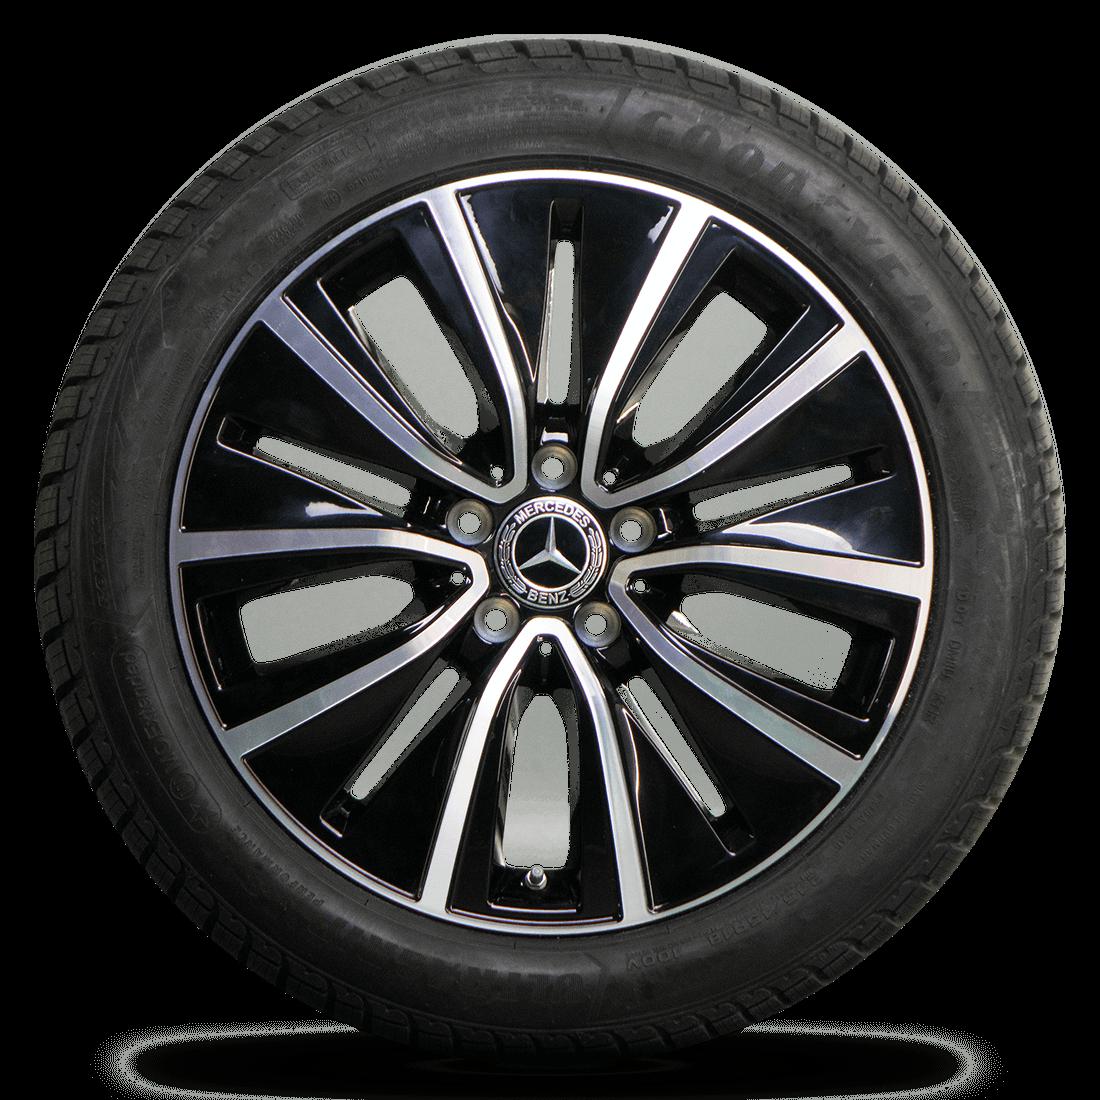 18 Inch Tires >> Mercedes 18 Inch Rims Cls C257 W257 Aluminum Rims Moe Winter Tires Winter